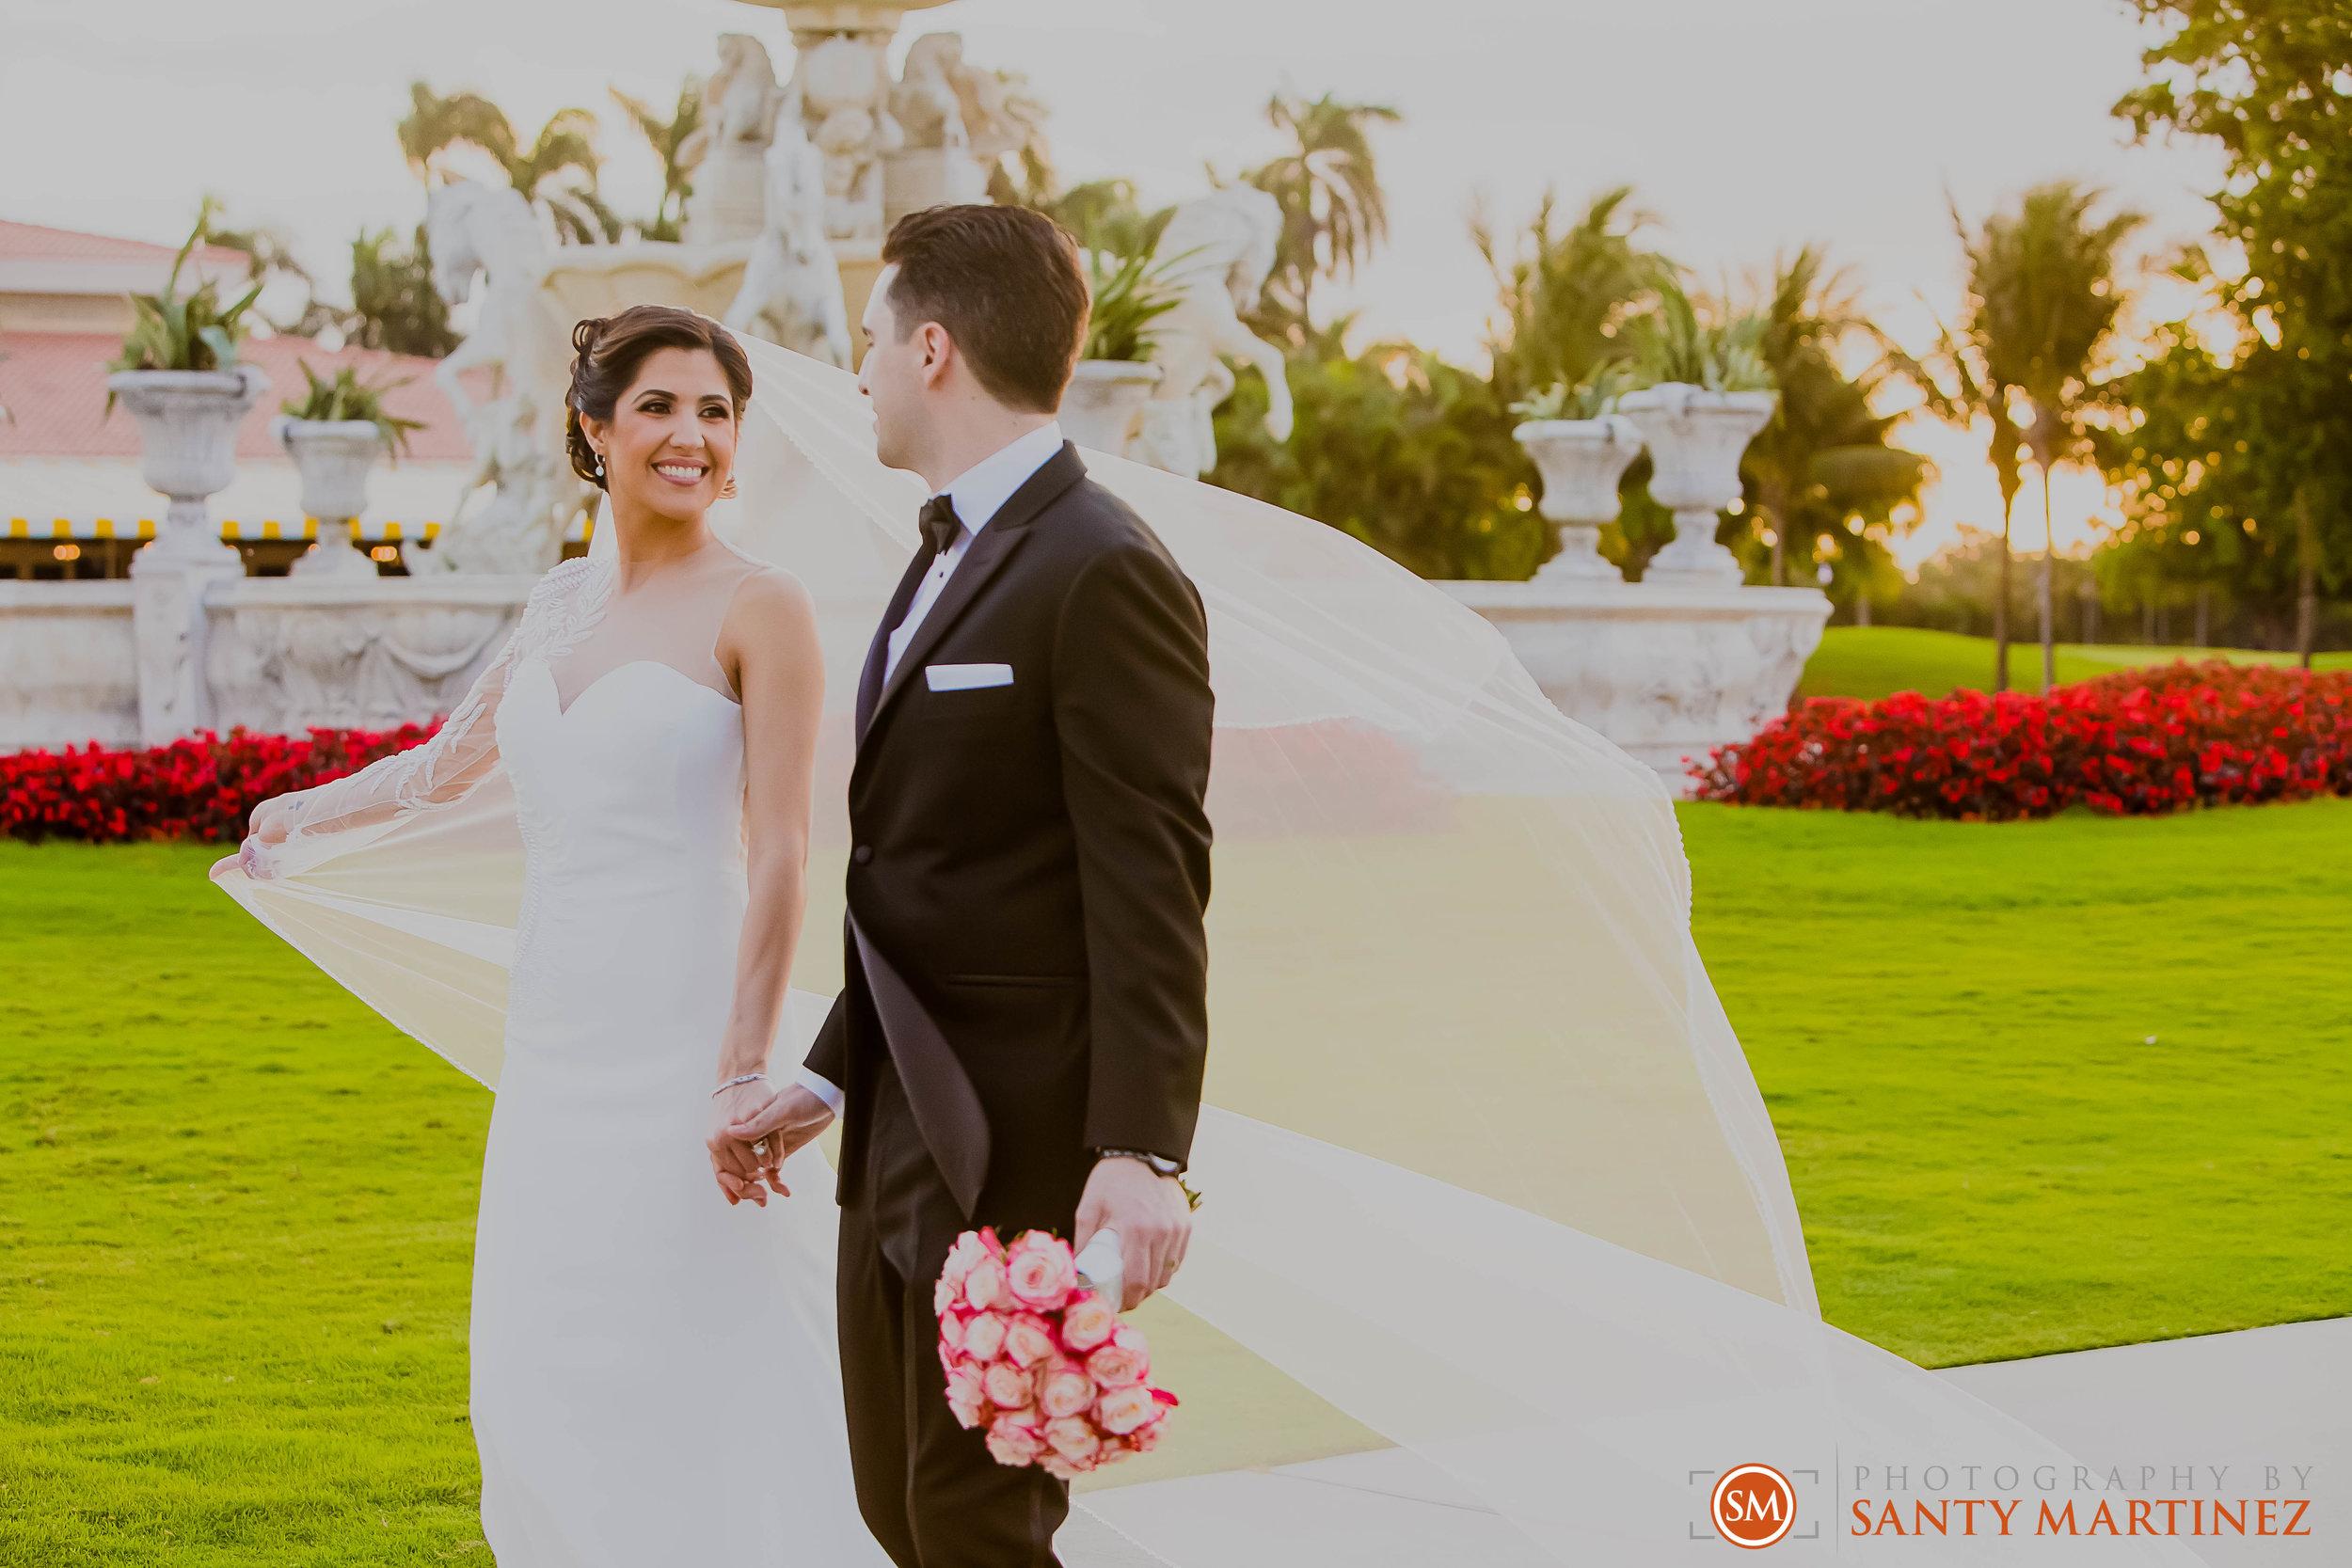 Wedding Trump National Doral Miami - Santy Martinez Photography-10.jpg